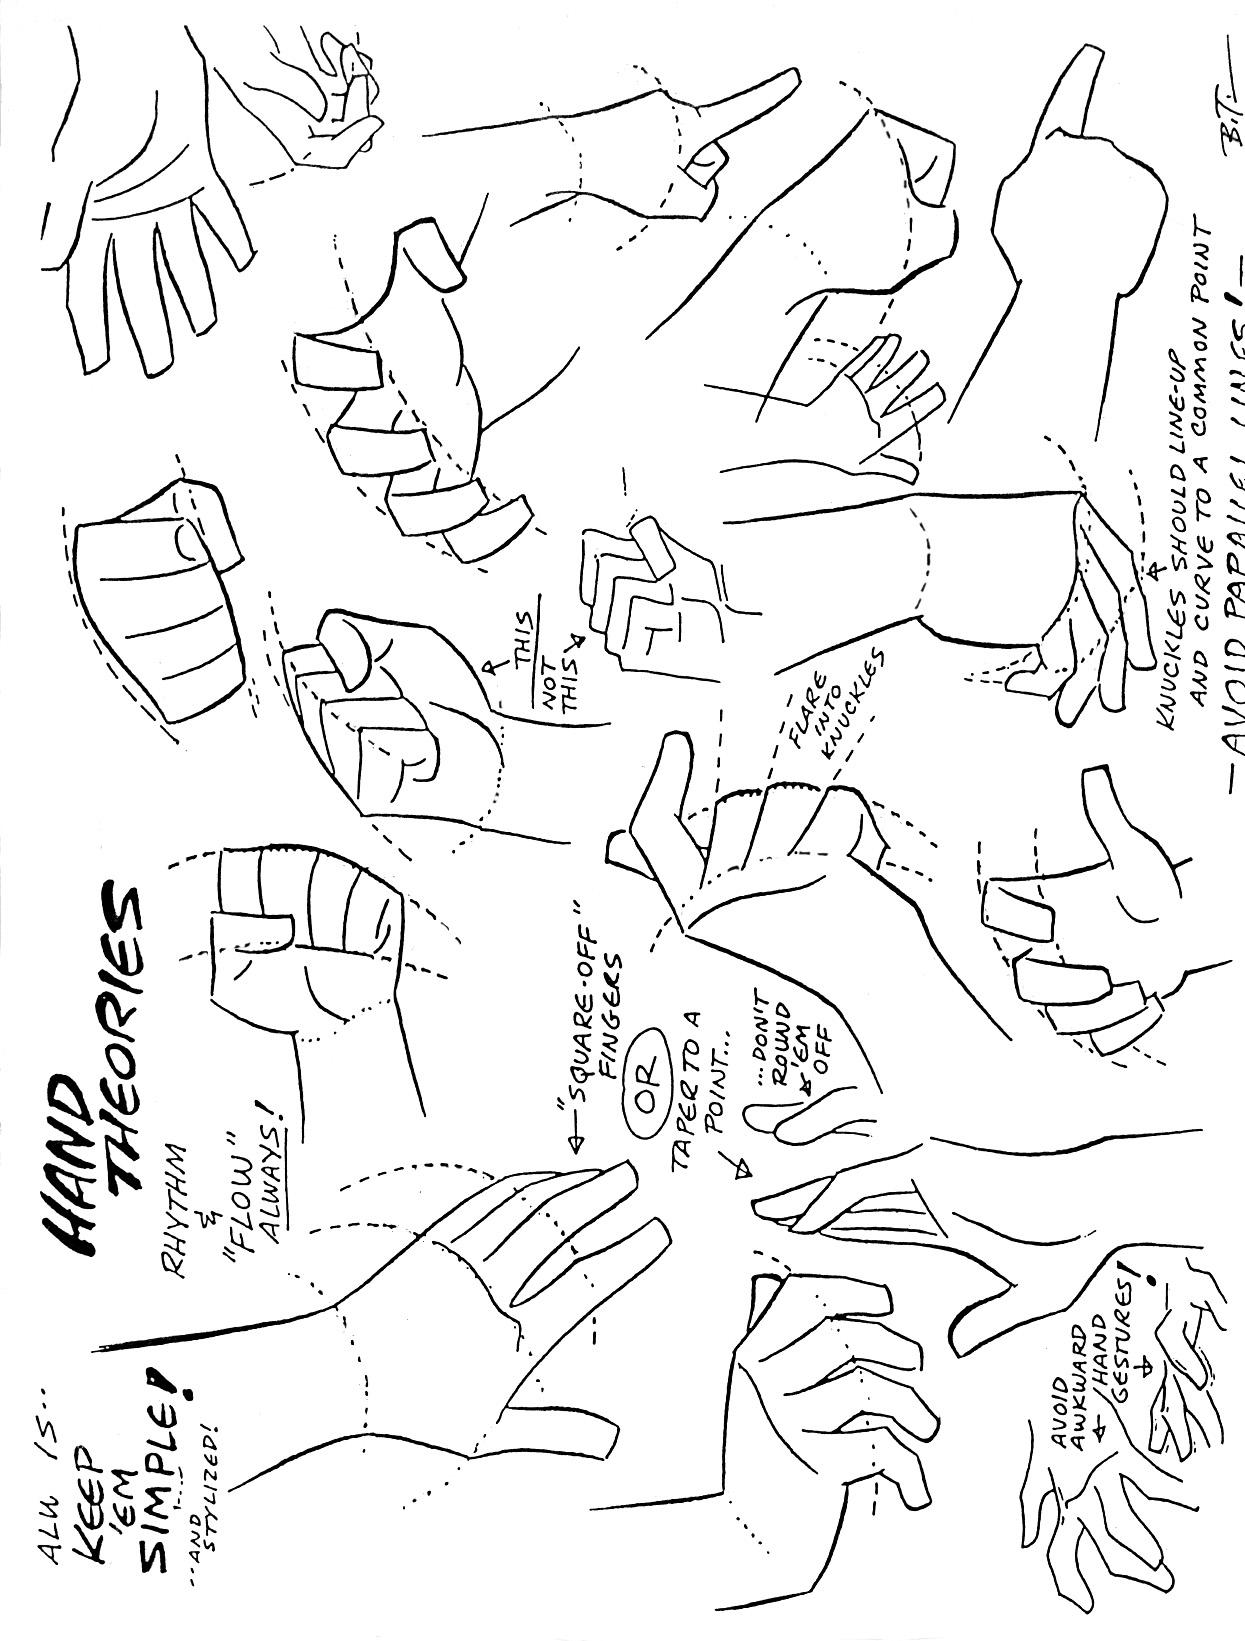 animopus hand poses galore